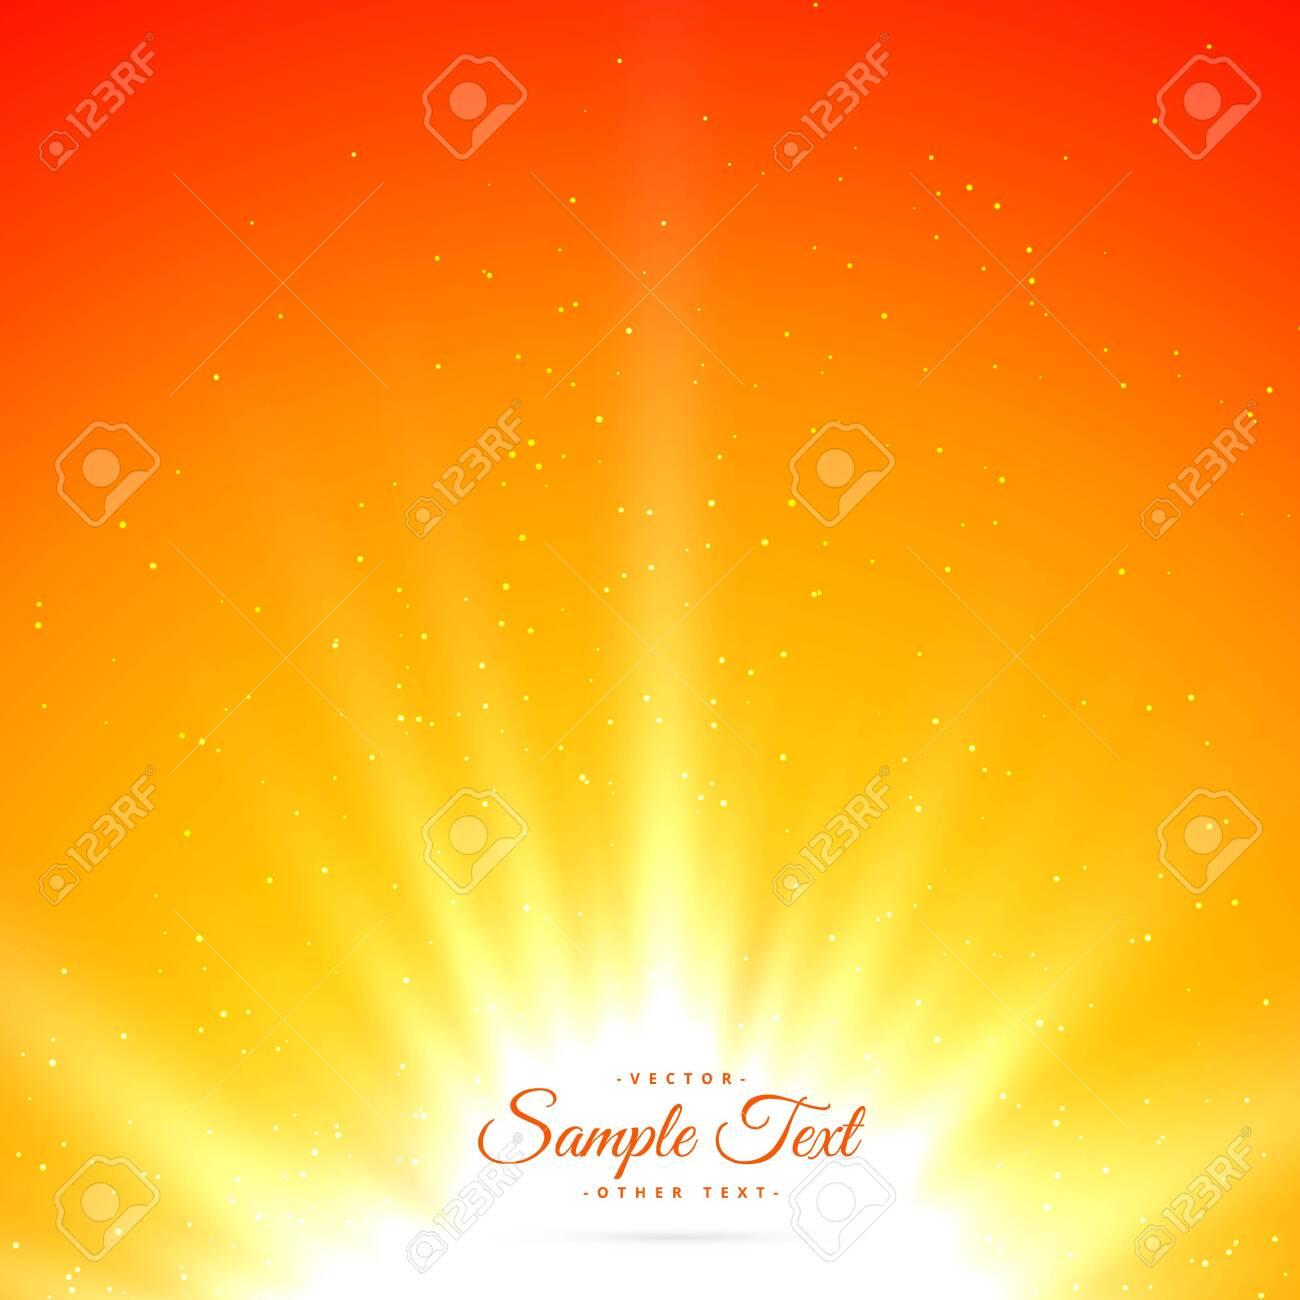 bright shiny sunburst background - 156719628